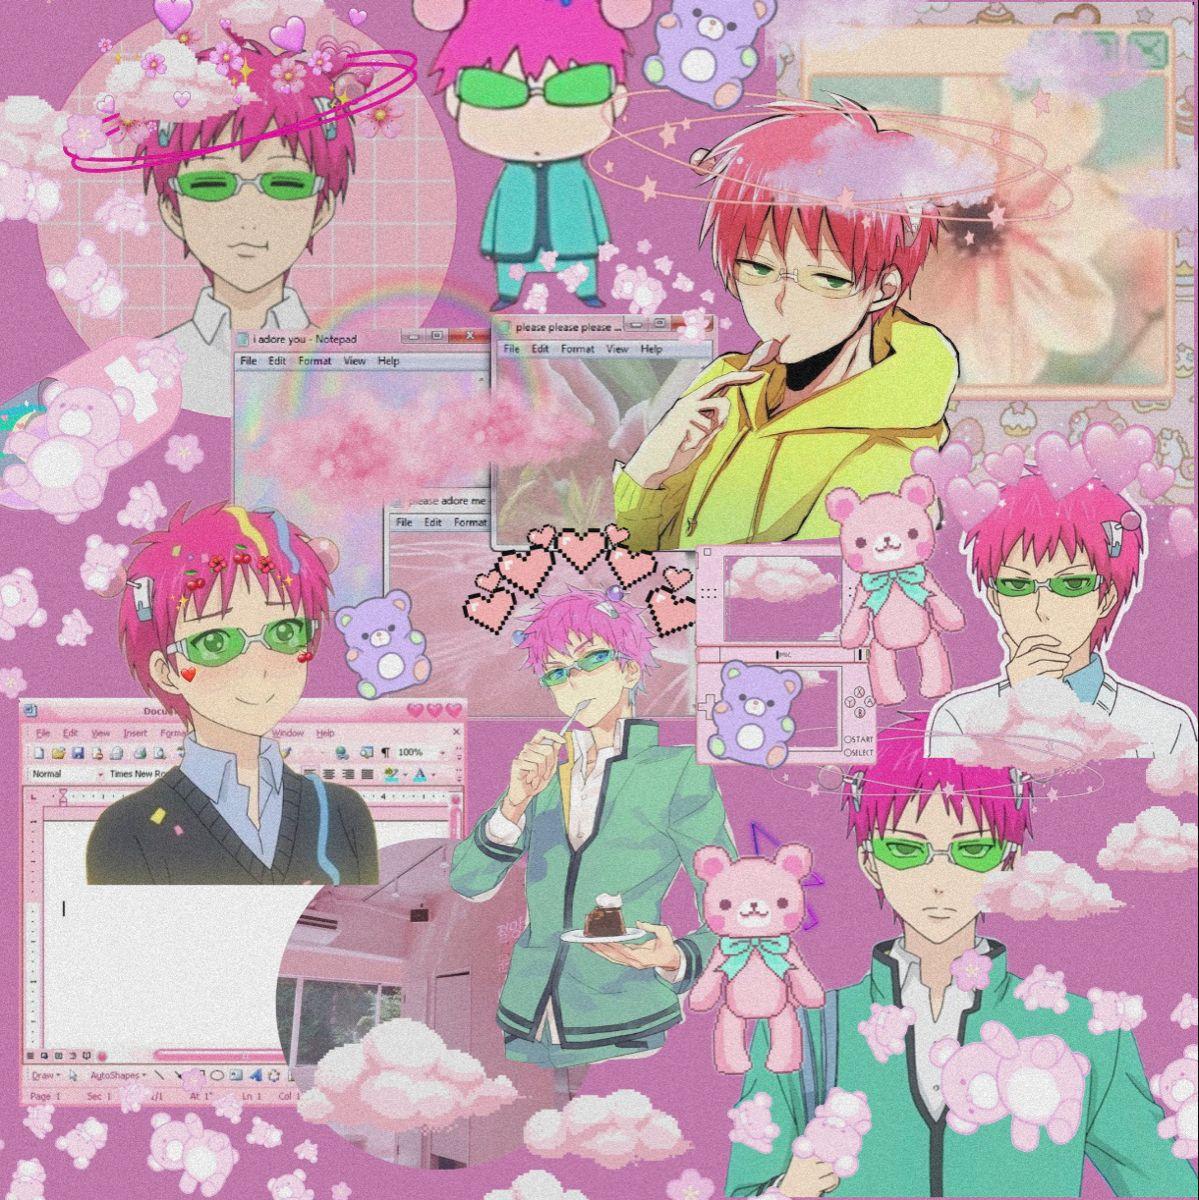 Pin By Zashelyn Padilla On Aesthetic Anime Anime Wallpaper Iphone Anime Computer Wallpaper Anime Wallpaper